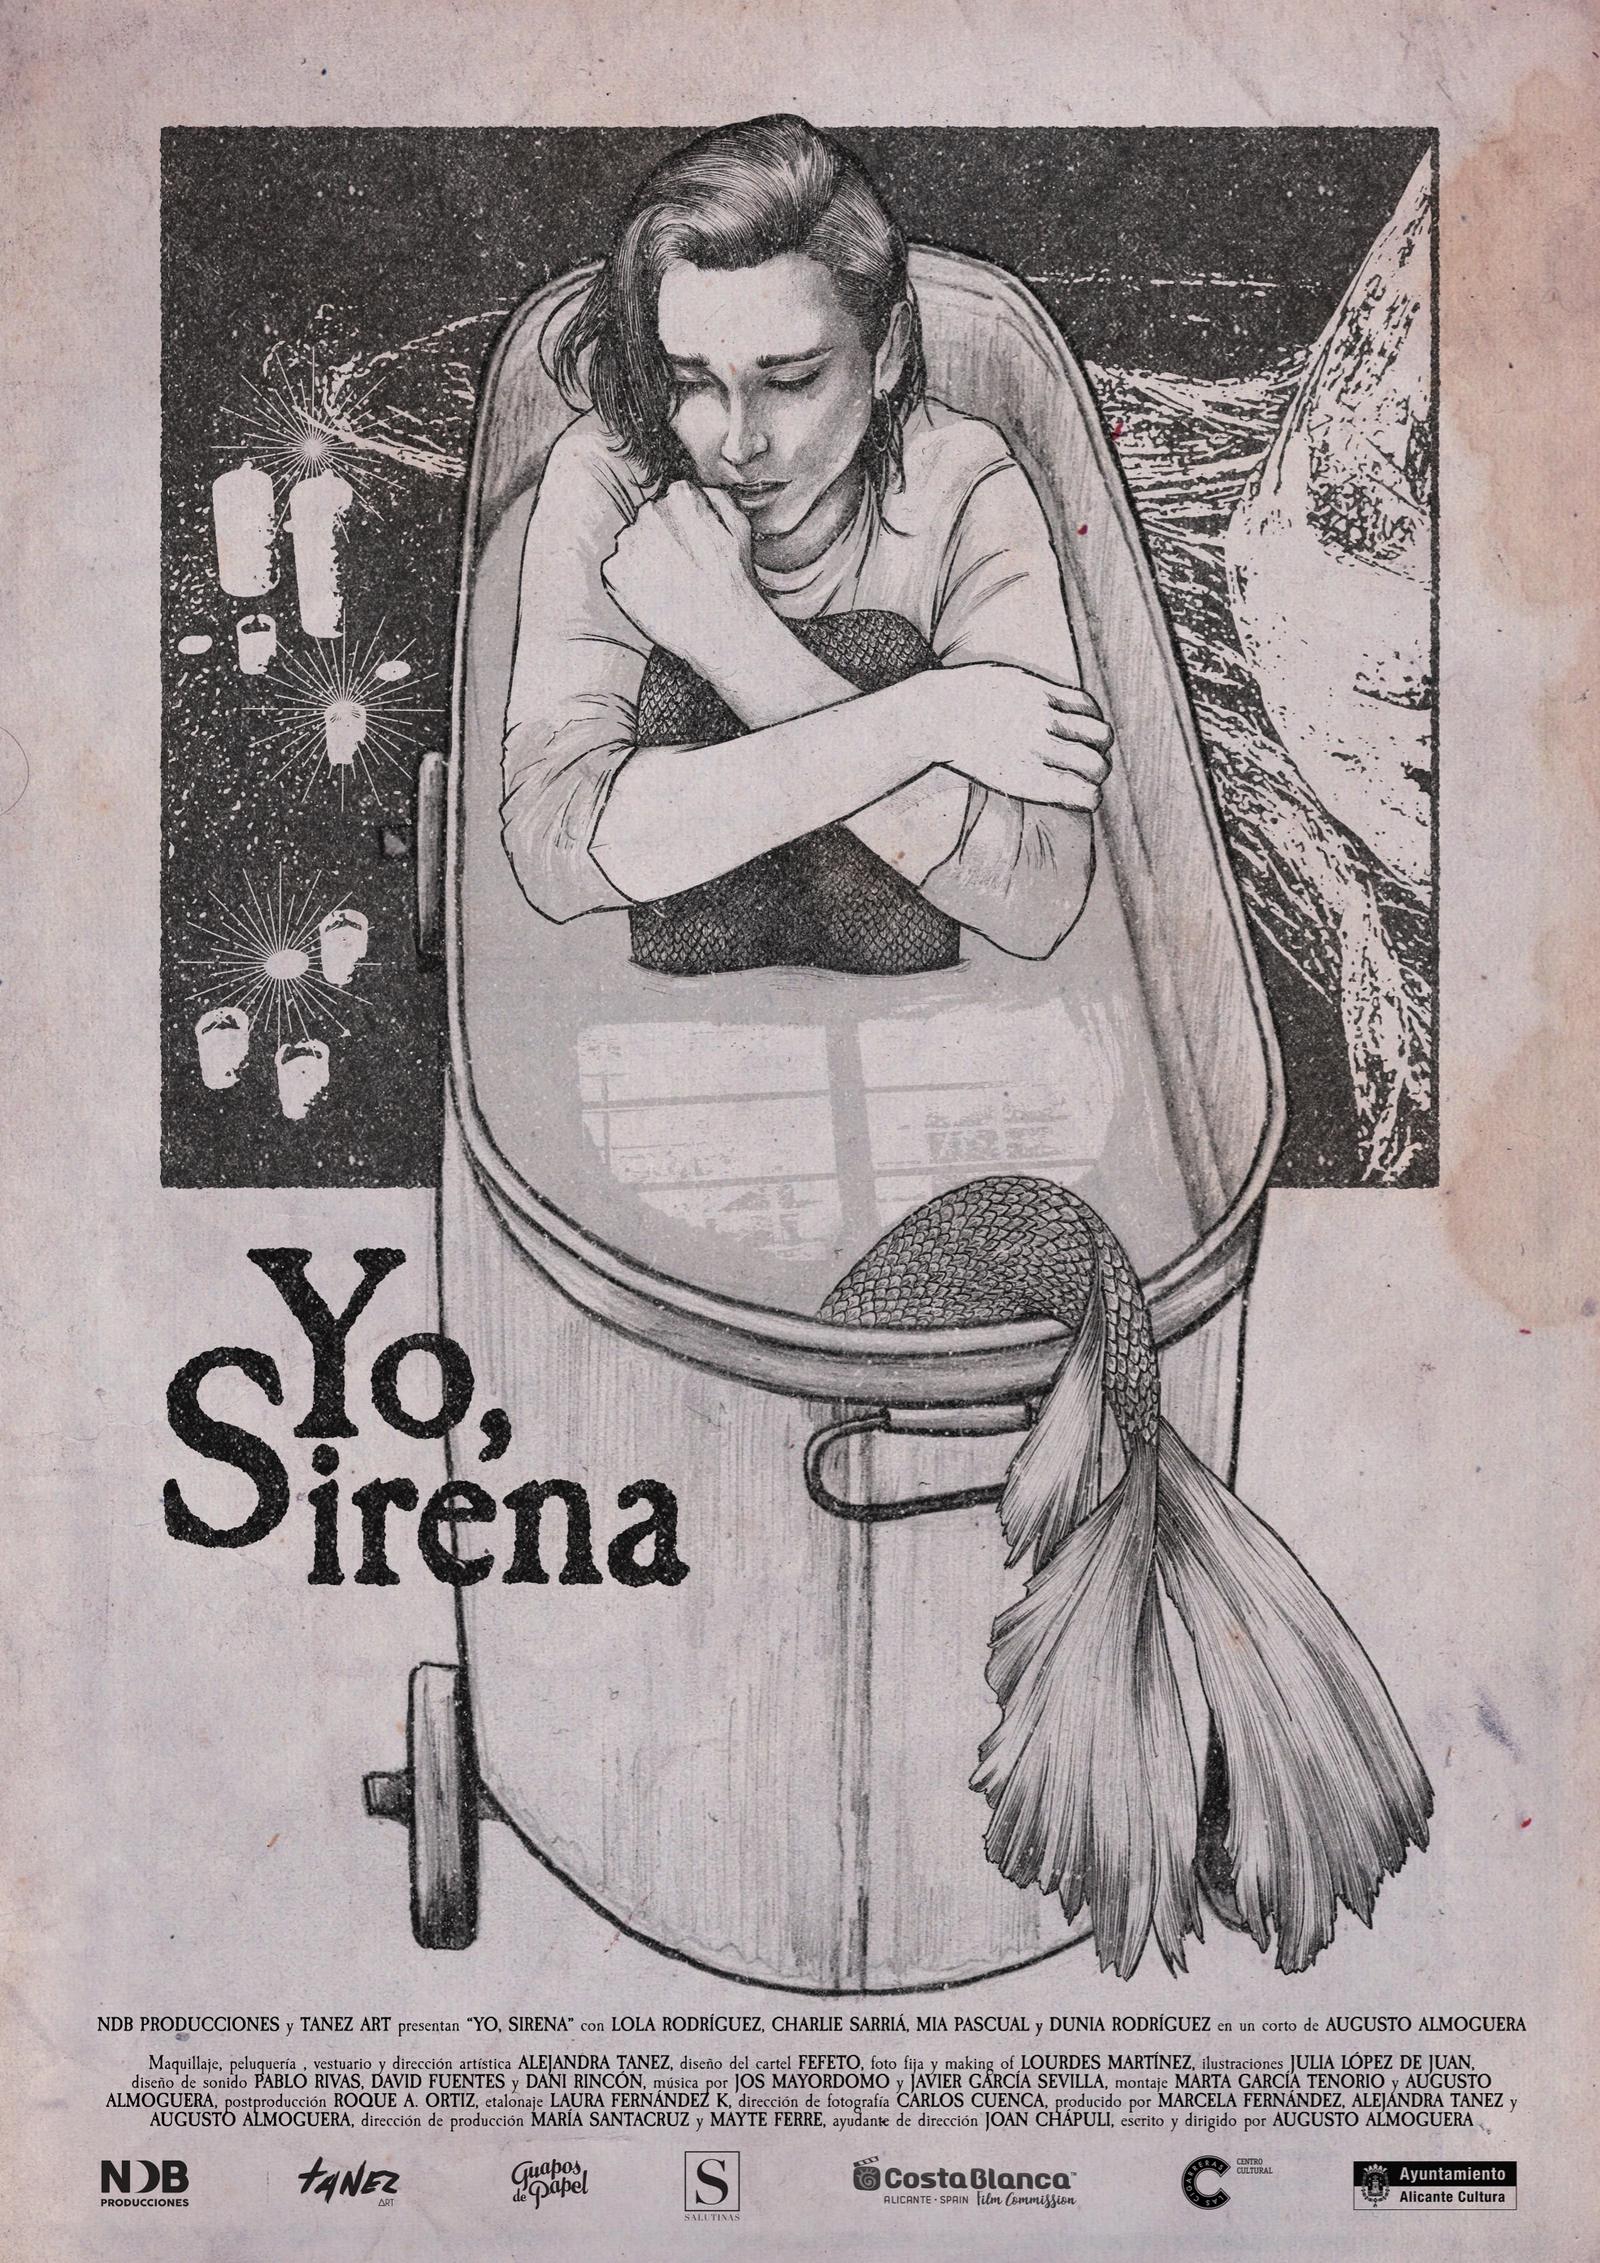 Yo, sirena (I, mermaid)